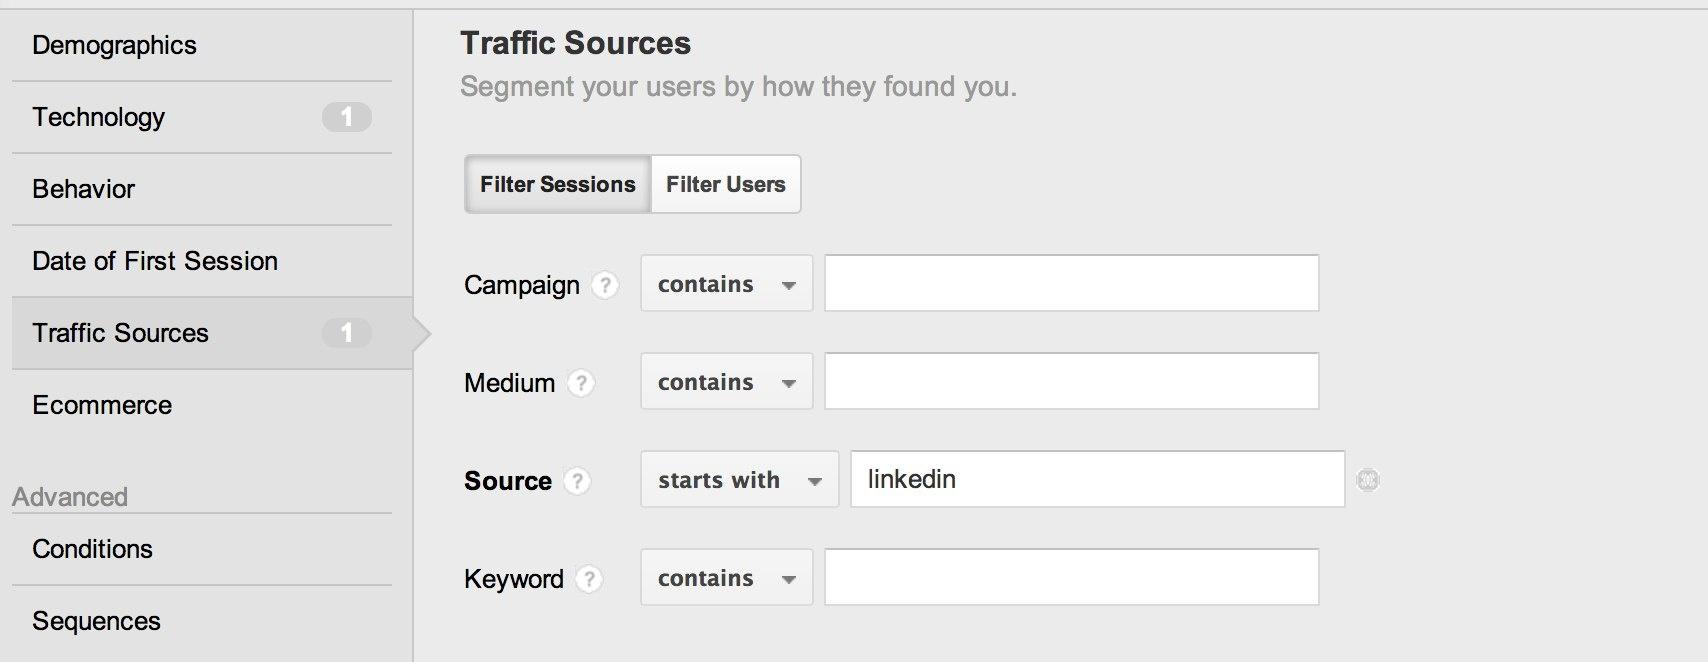 create segment with traffic source equals linkedin